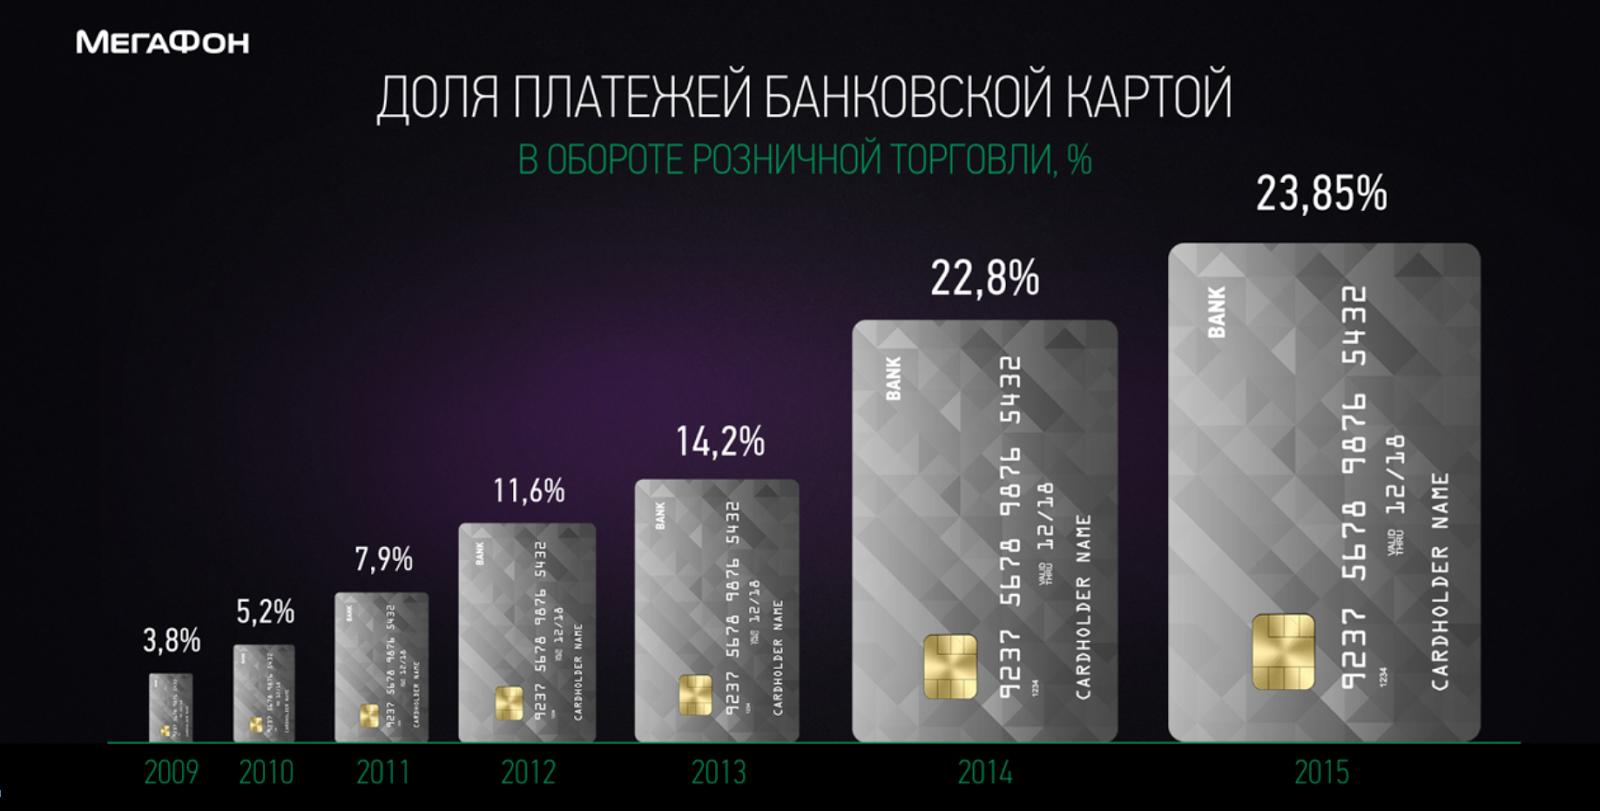 Банковская карта от «МегаФона» - 4